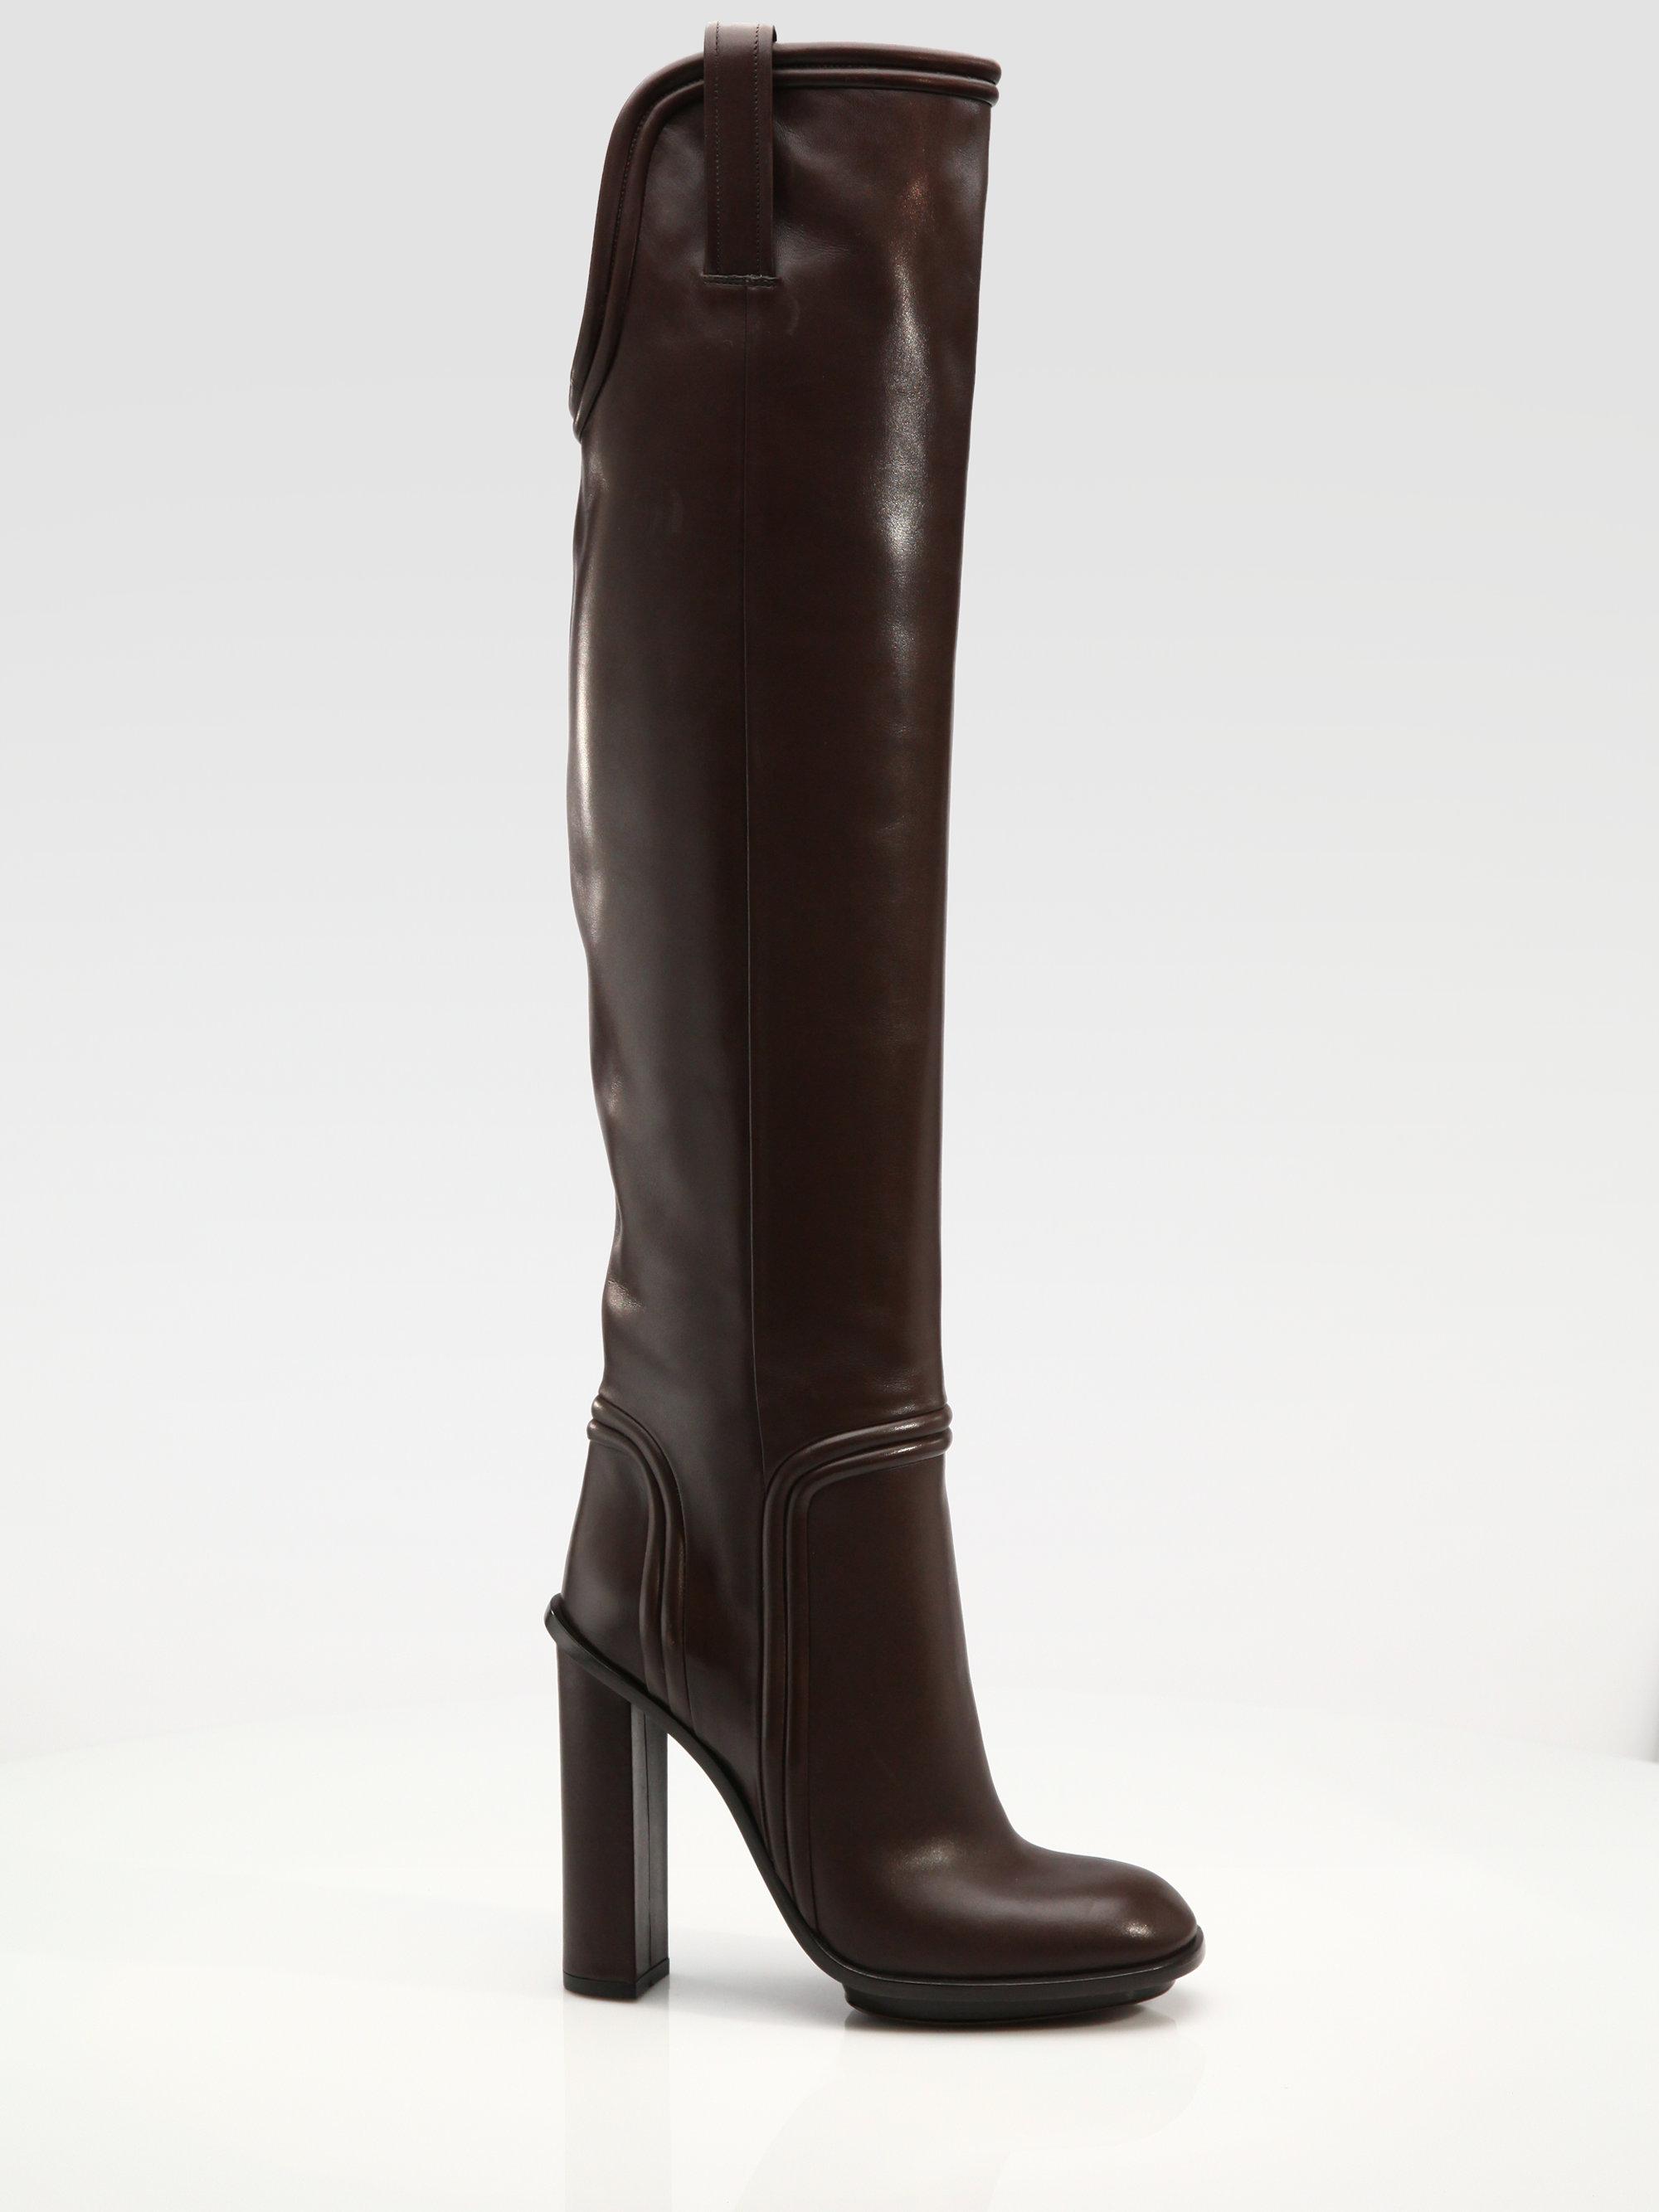 4caa0c901 Gucci Trish Highheel Platform Boots in Black - Lyst